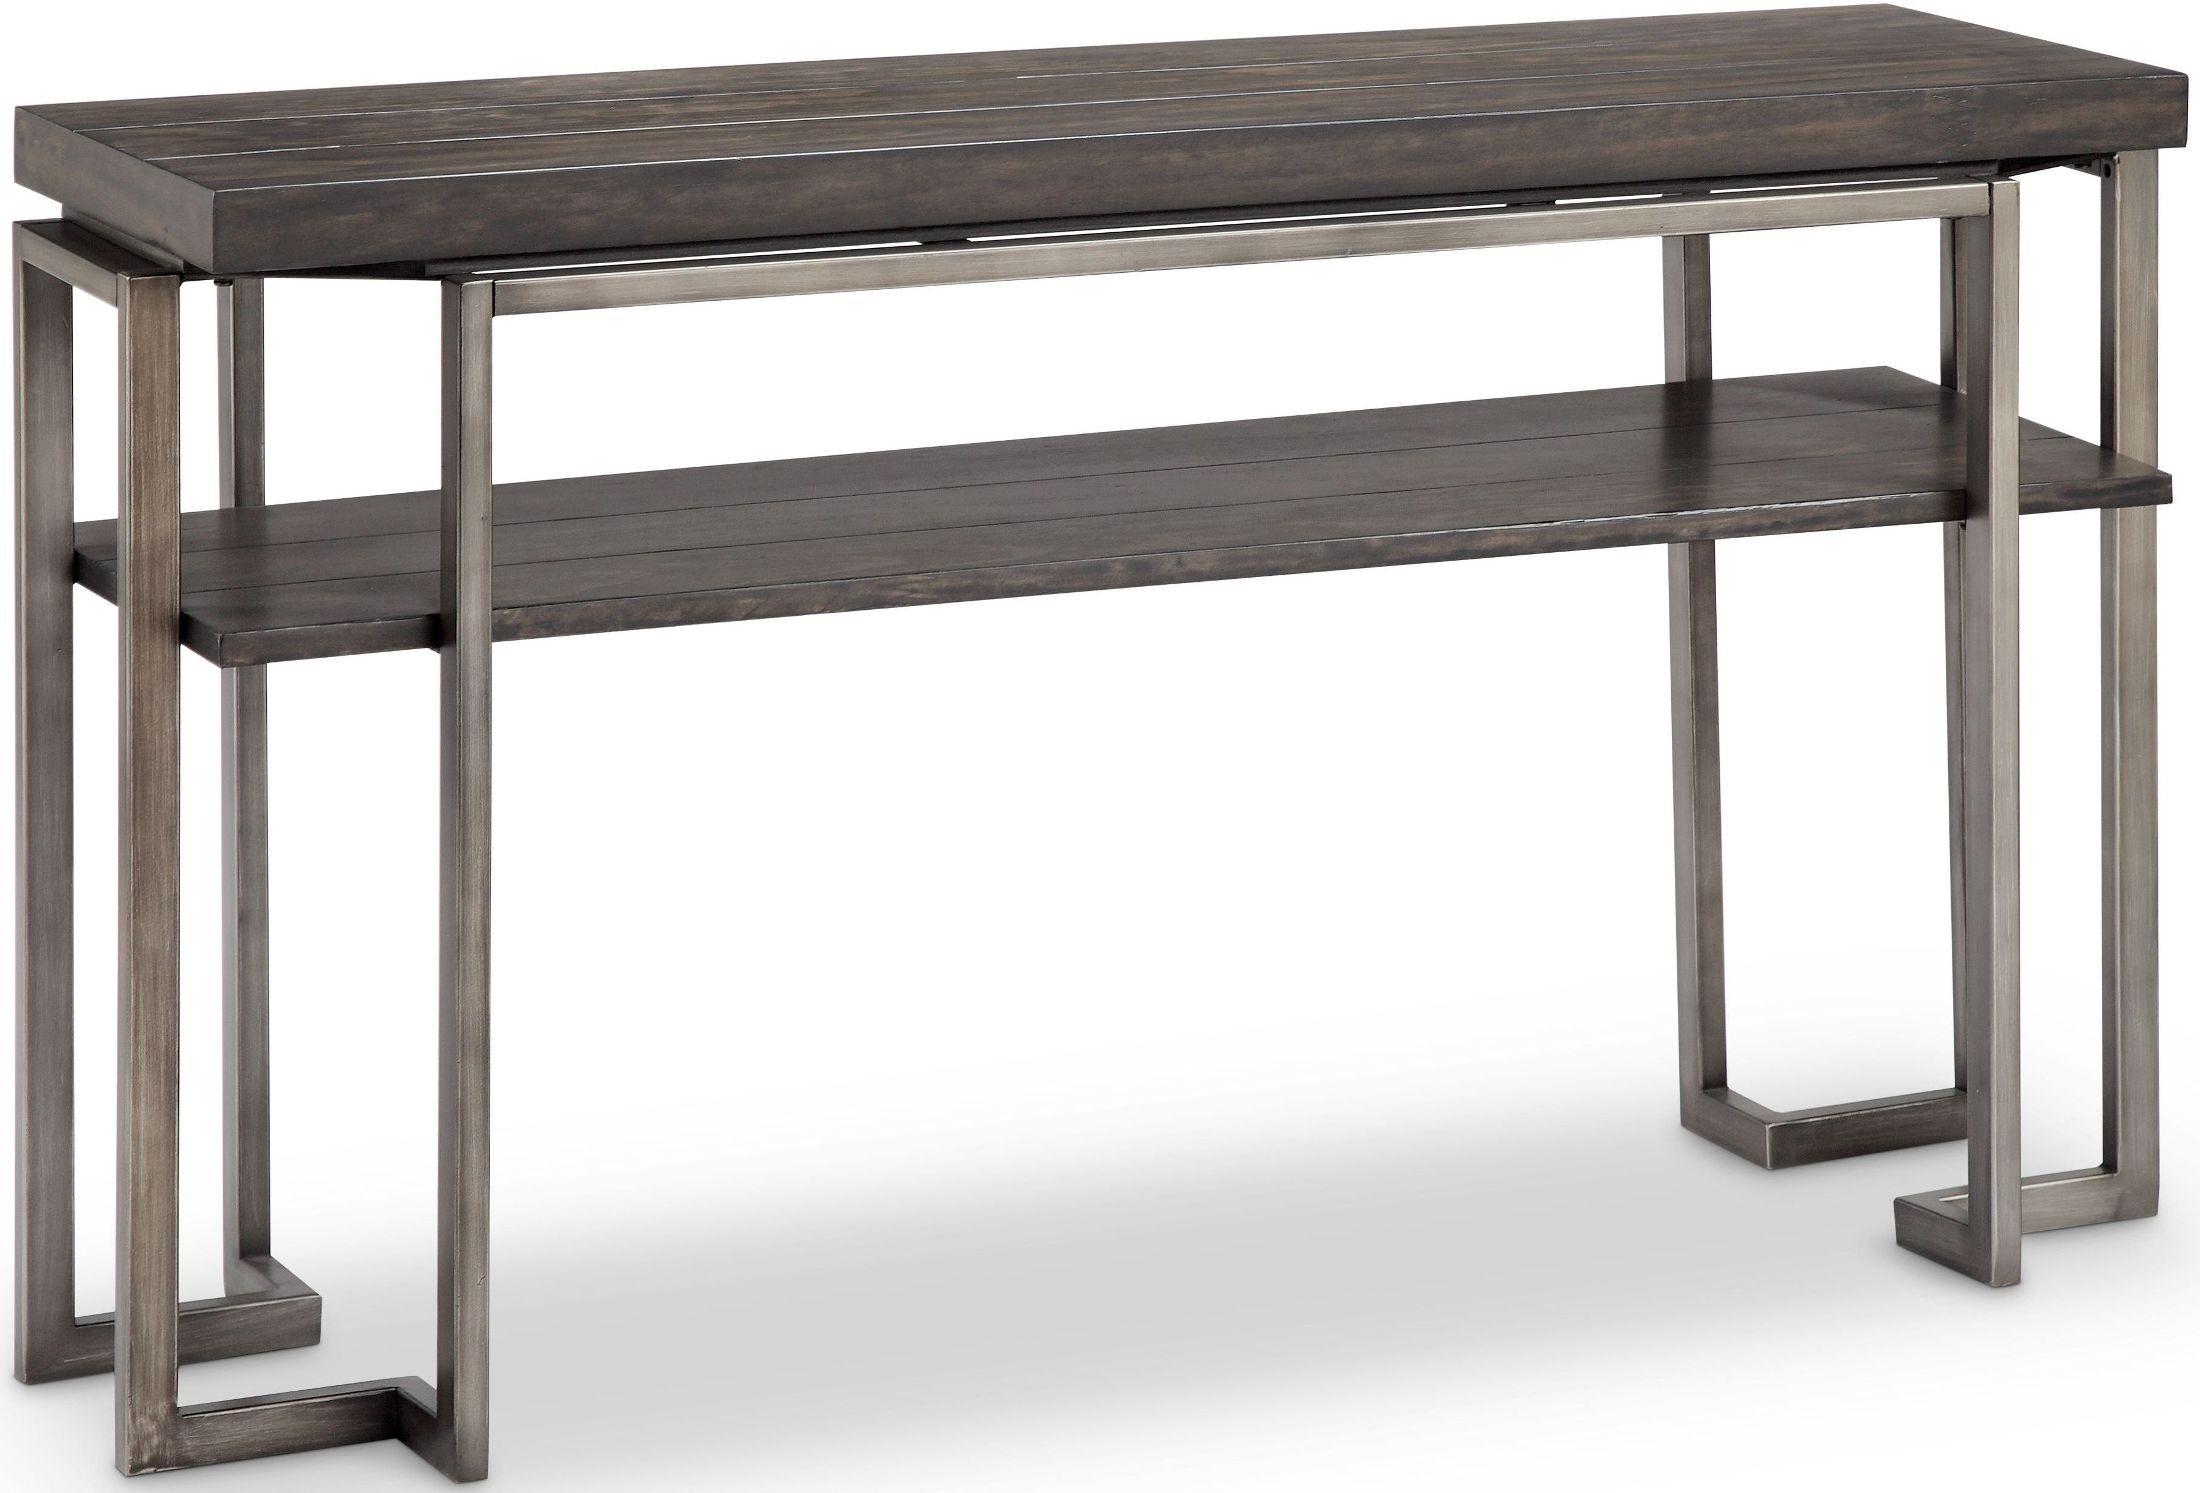 Millbourne burnished caramel metal rectangular sofa table for Sofa table metal